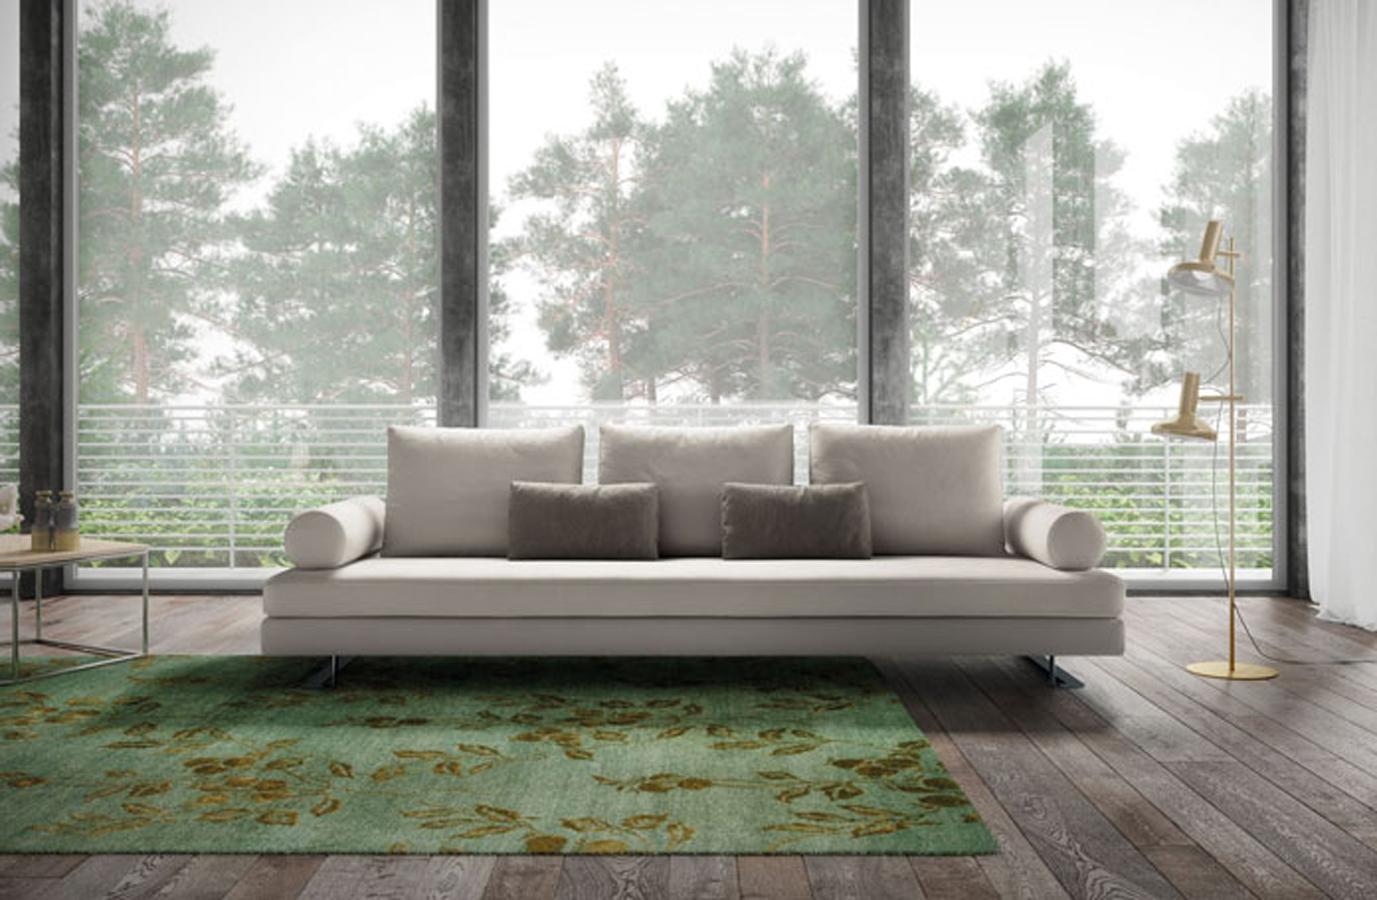 https://www.righetti.it/wp-content/uploads/2017/02/Samoa-divano-Harmony-1-moderno-design-stoffa-pelle-ecopelle-angolo-3-2-posti-chaise-longue-arredamento-mobili-righetti-novara.jpg